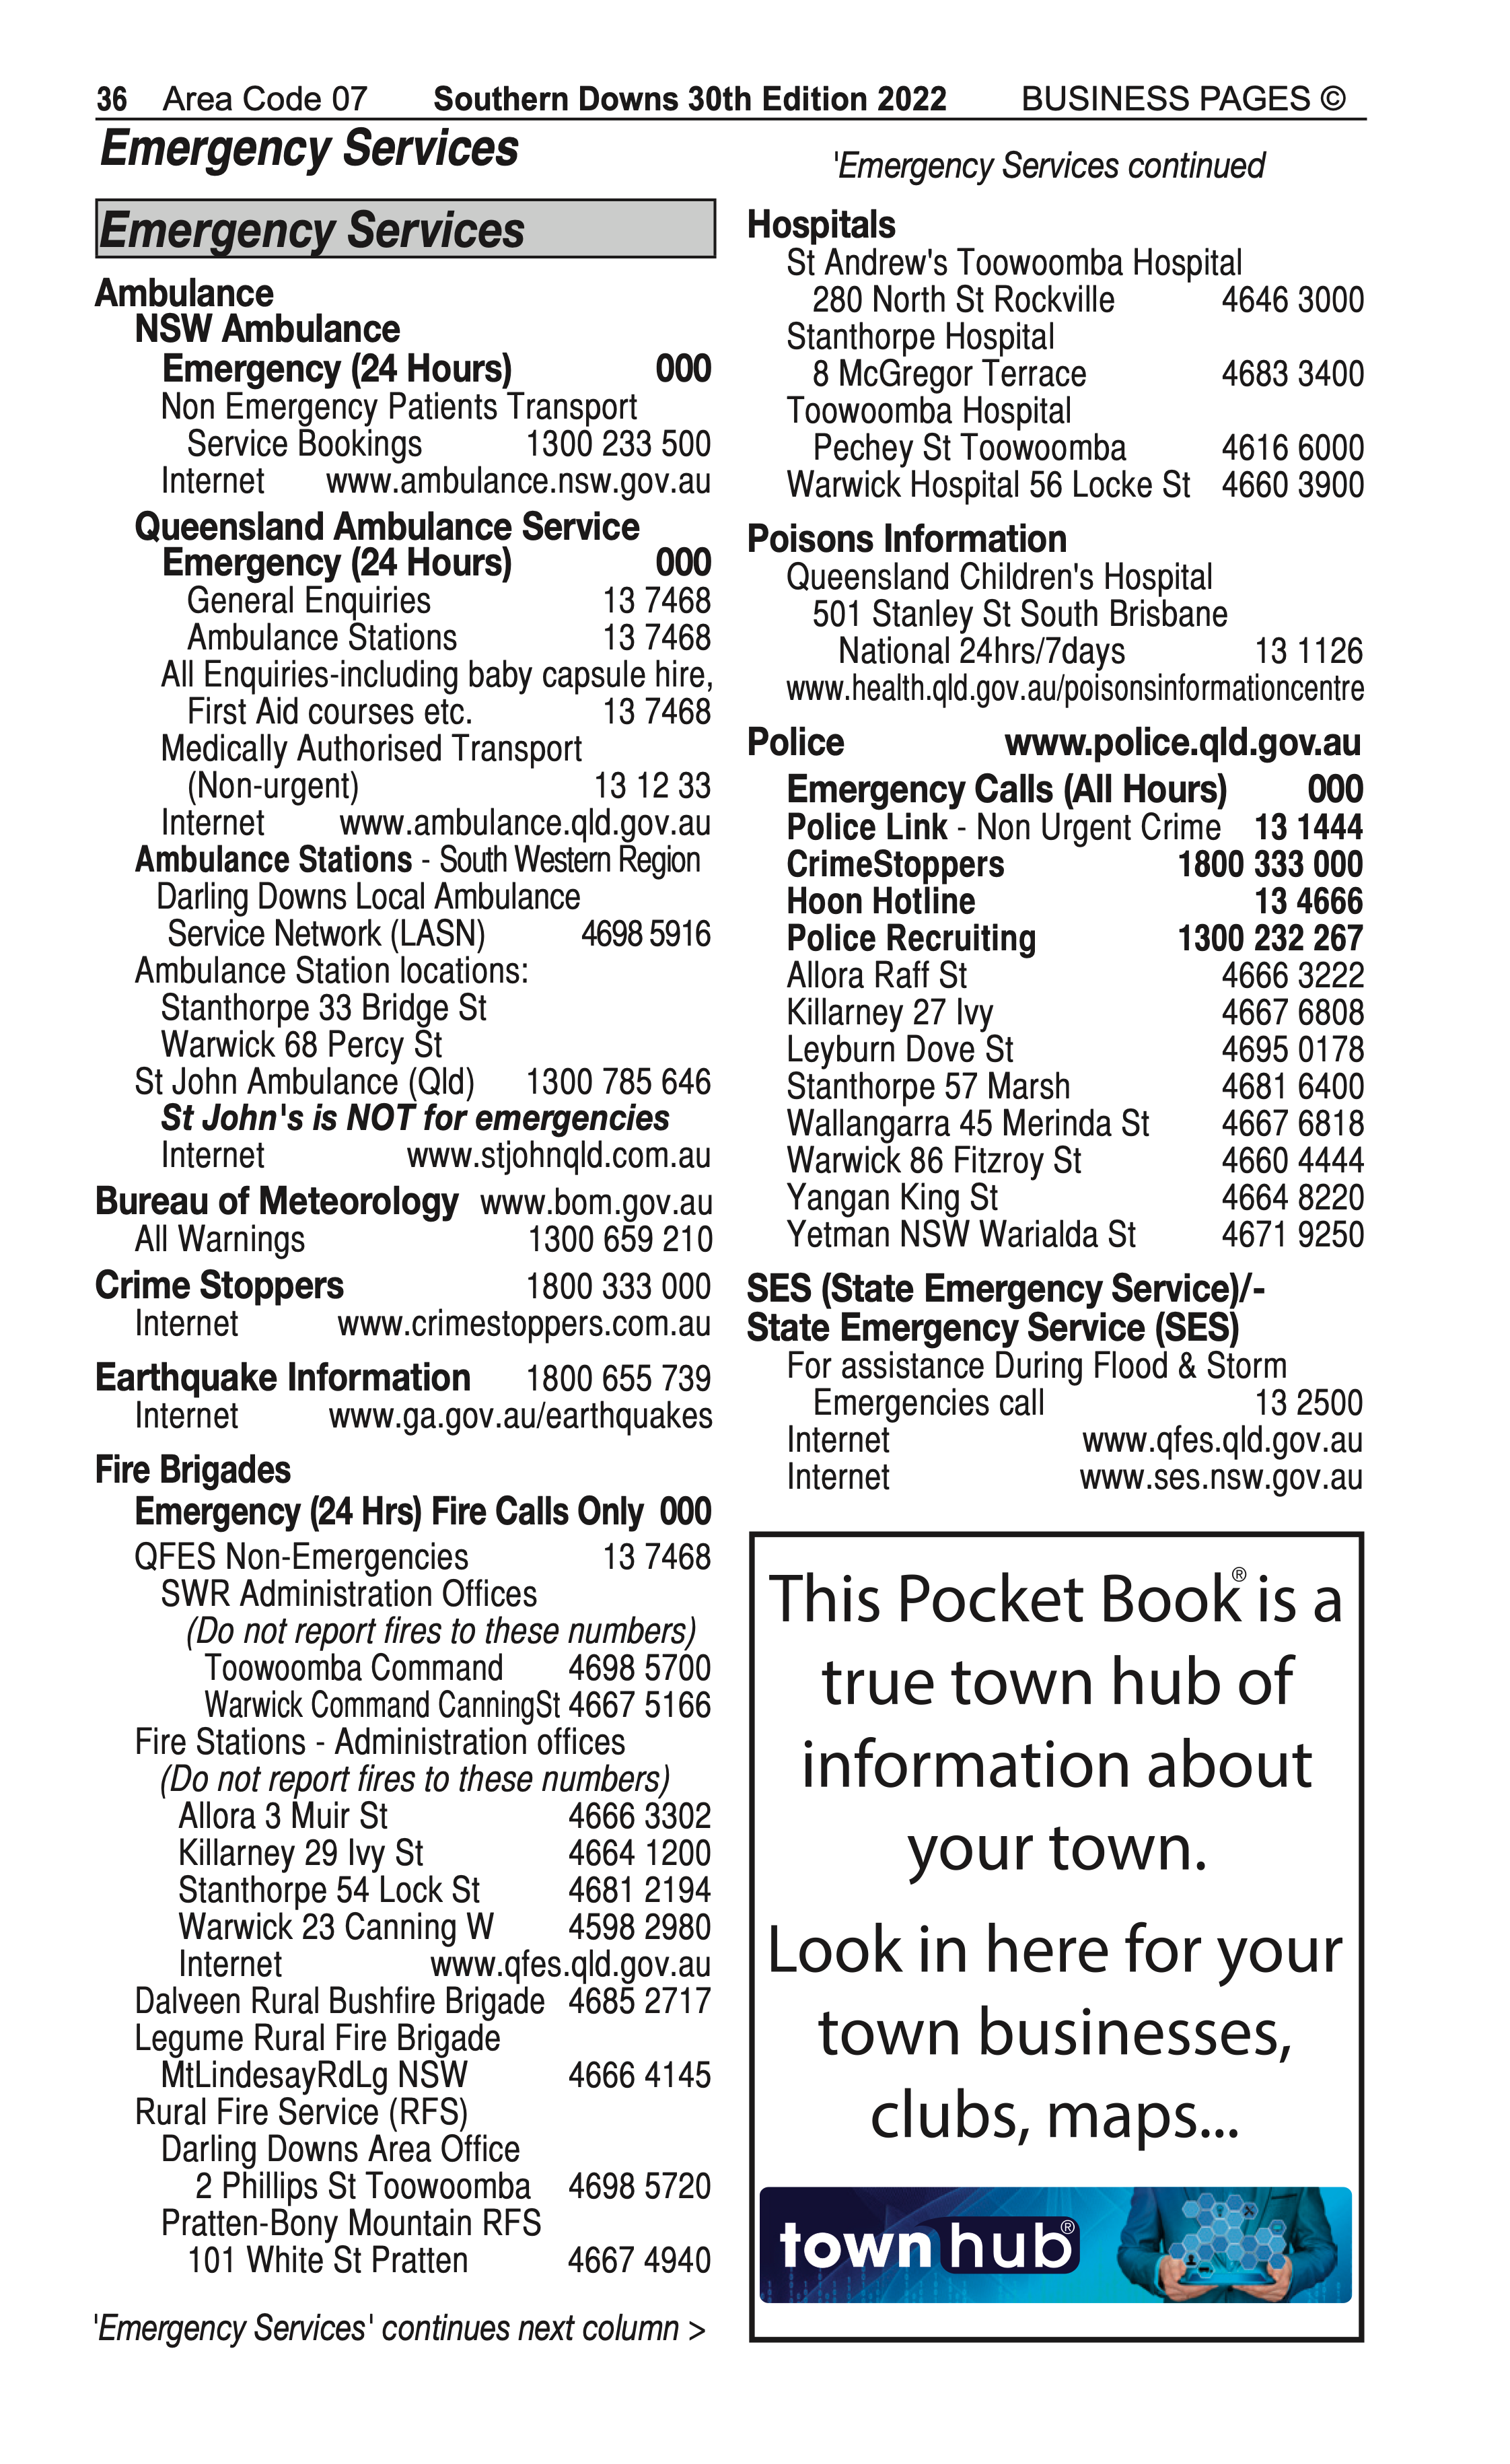 Mick Weier Concreting & Bobcatting | Concrete Contractors & Concretors in Wiyarra | PBezy Pocket Books local directories - page 36